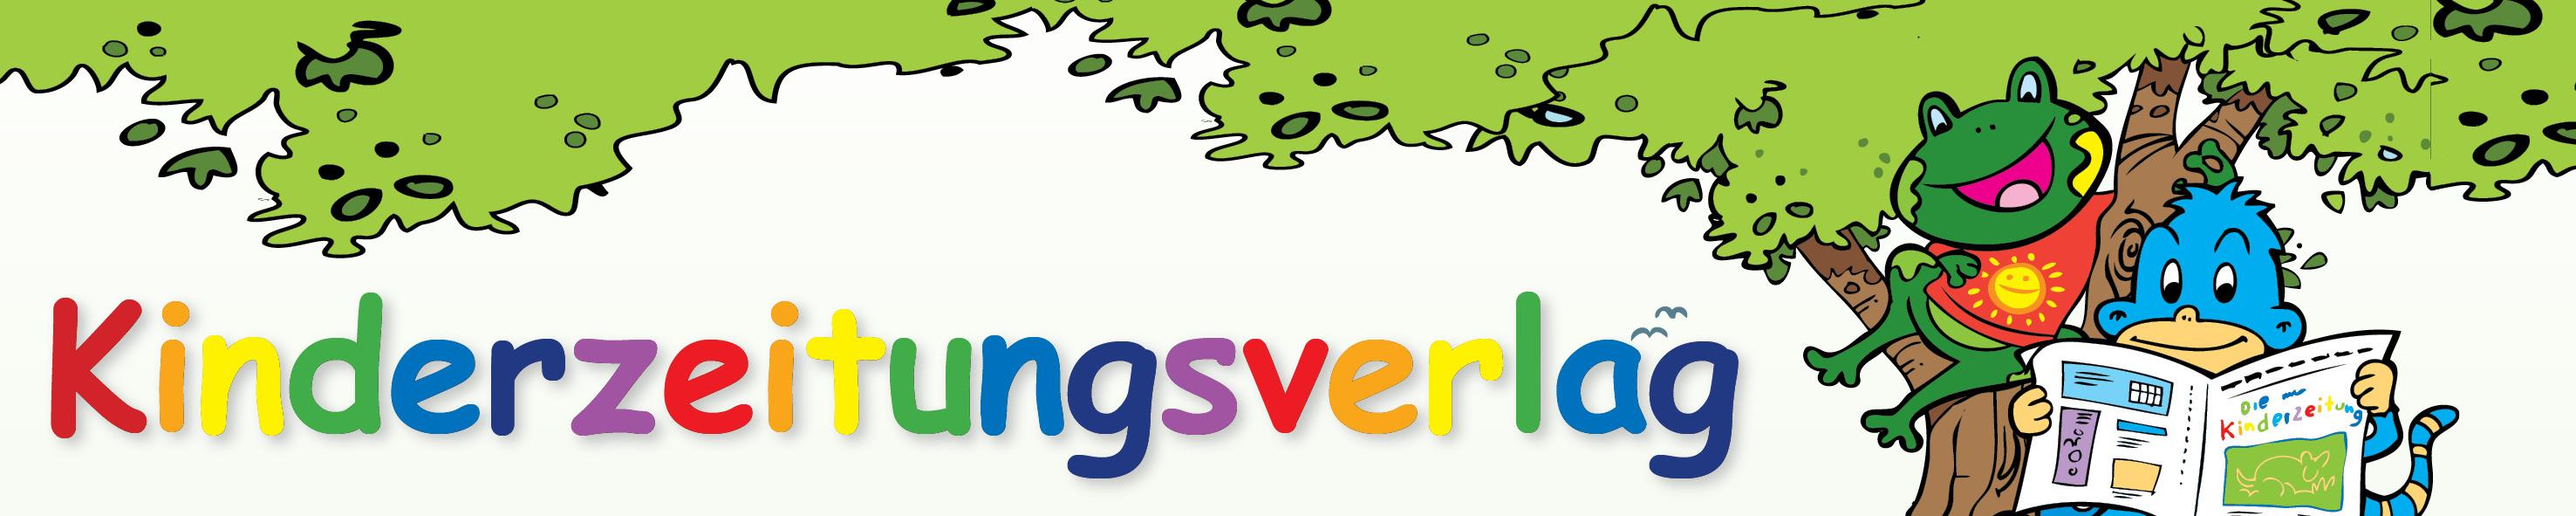 Kinderzeitungsverlag-Logo